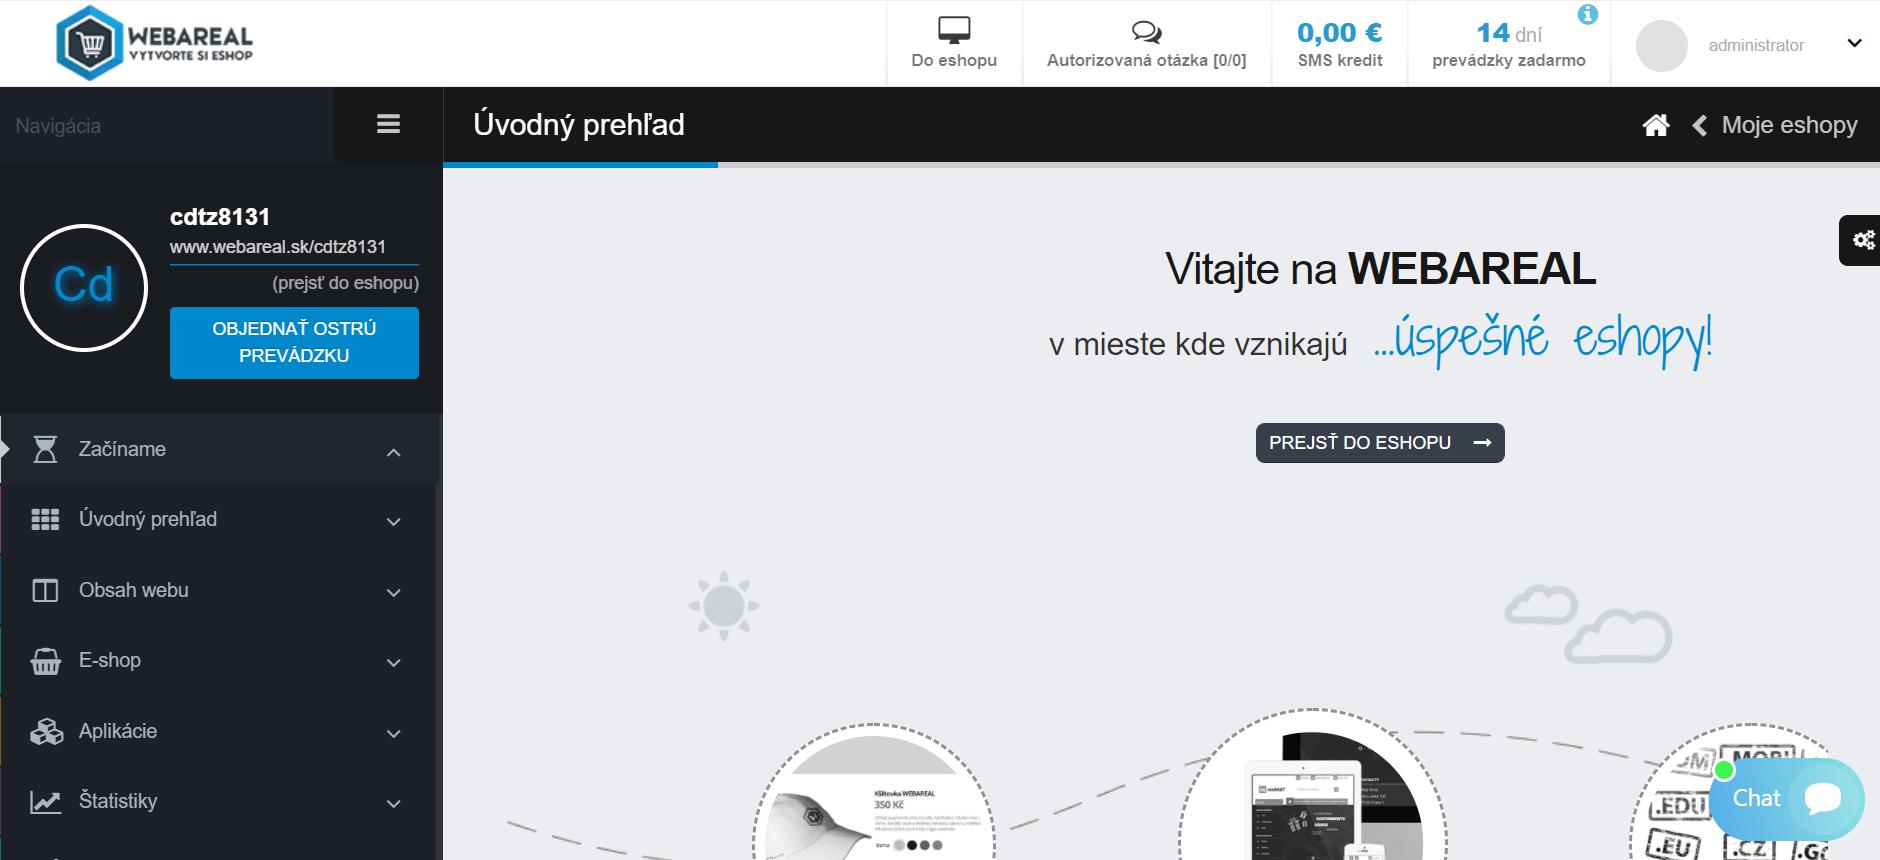 Webreal úvod do e-shopu